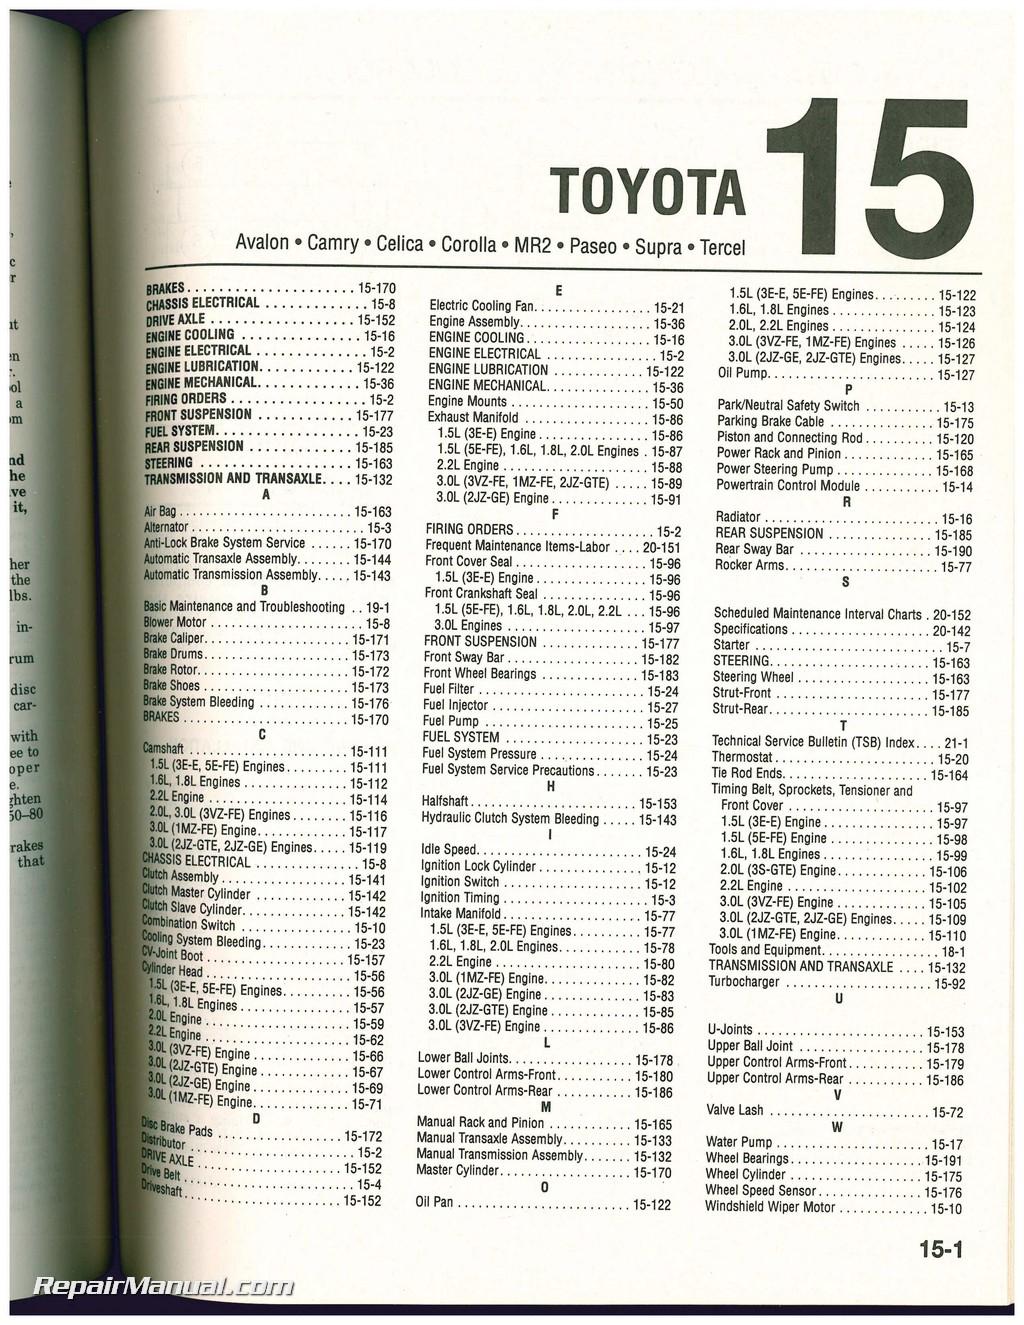 Chilton Import Car Repair Manual